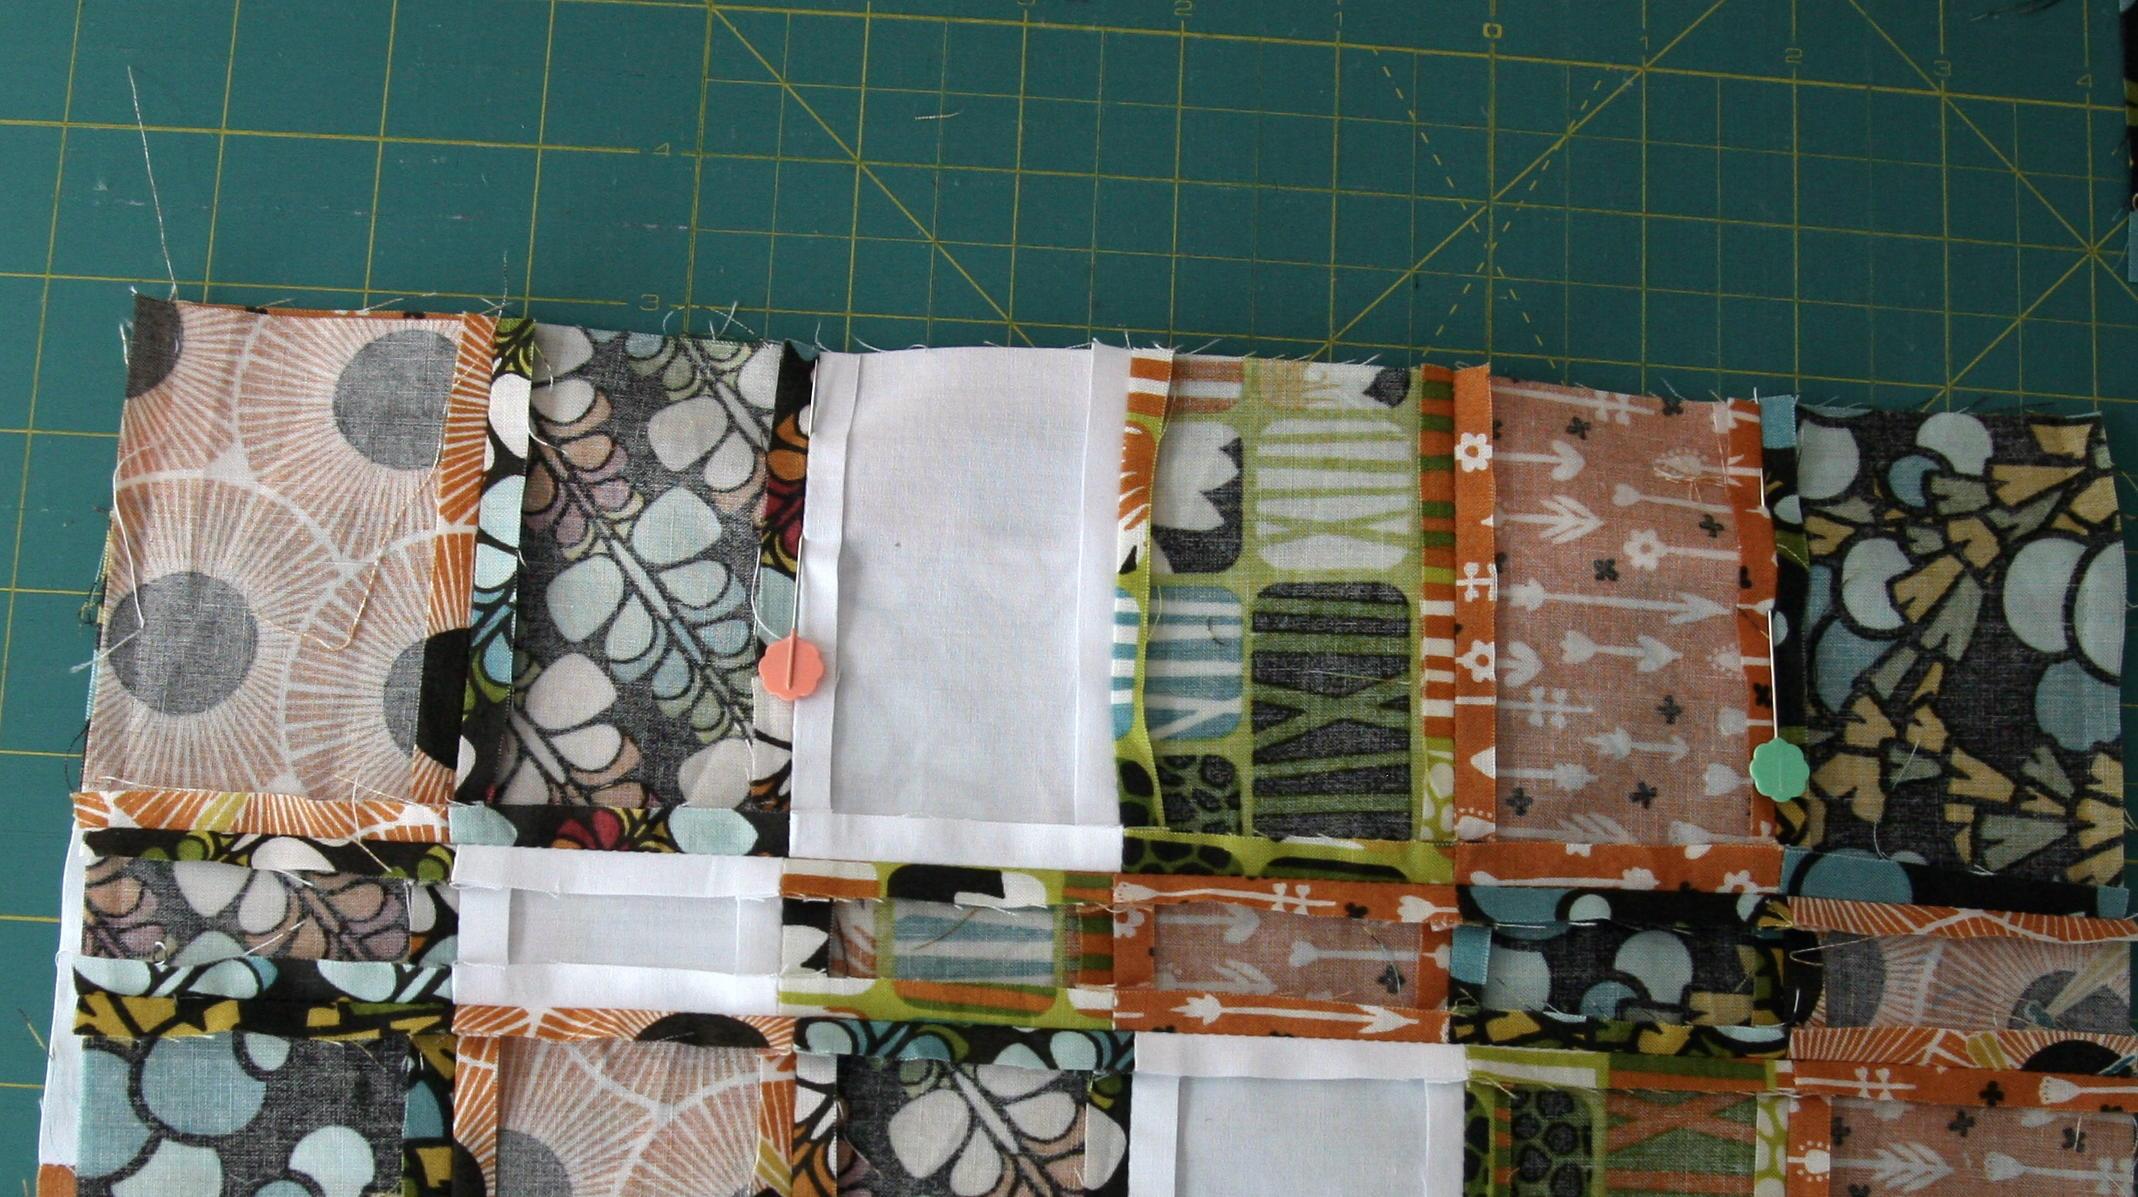 técnica de patchwork sujetar costuras